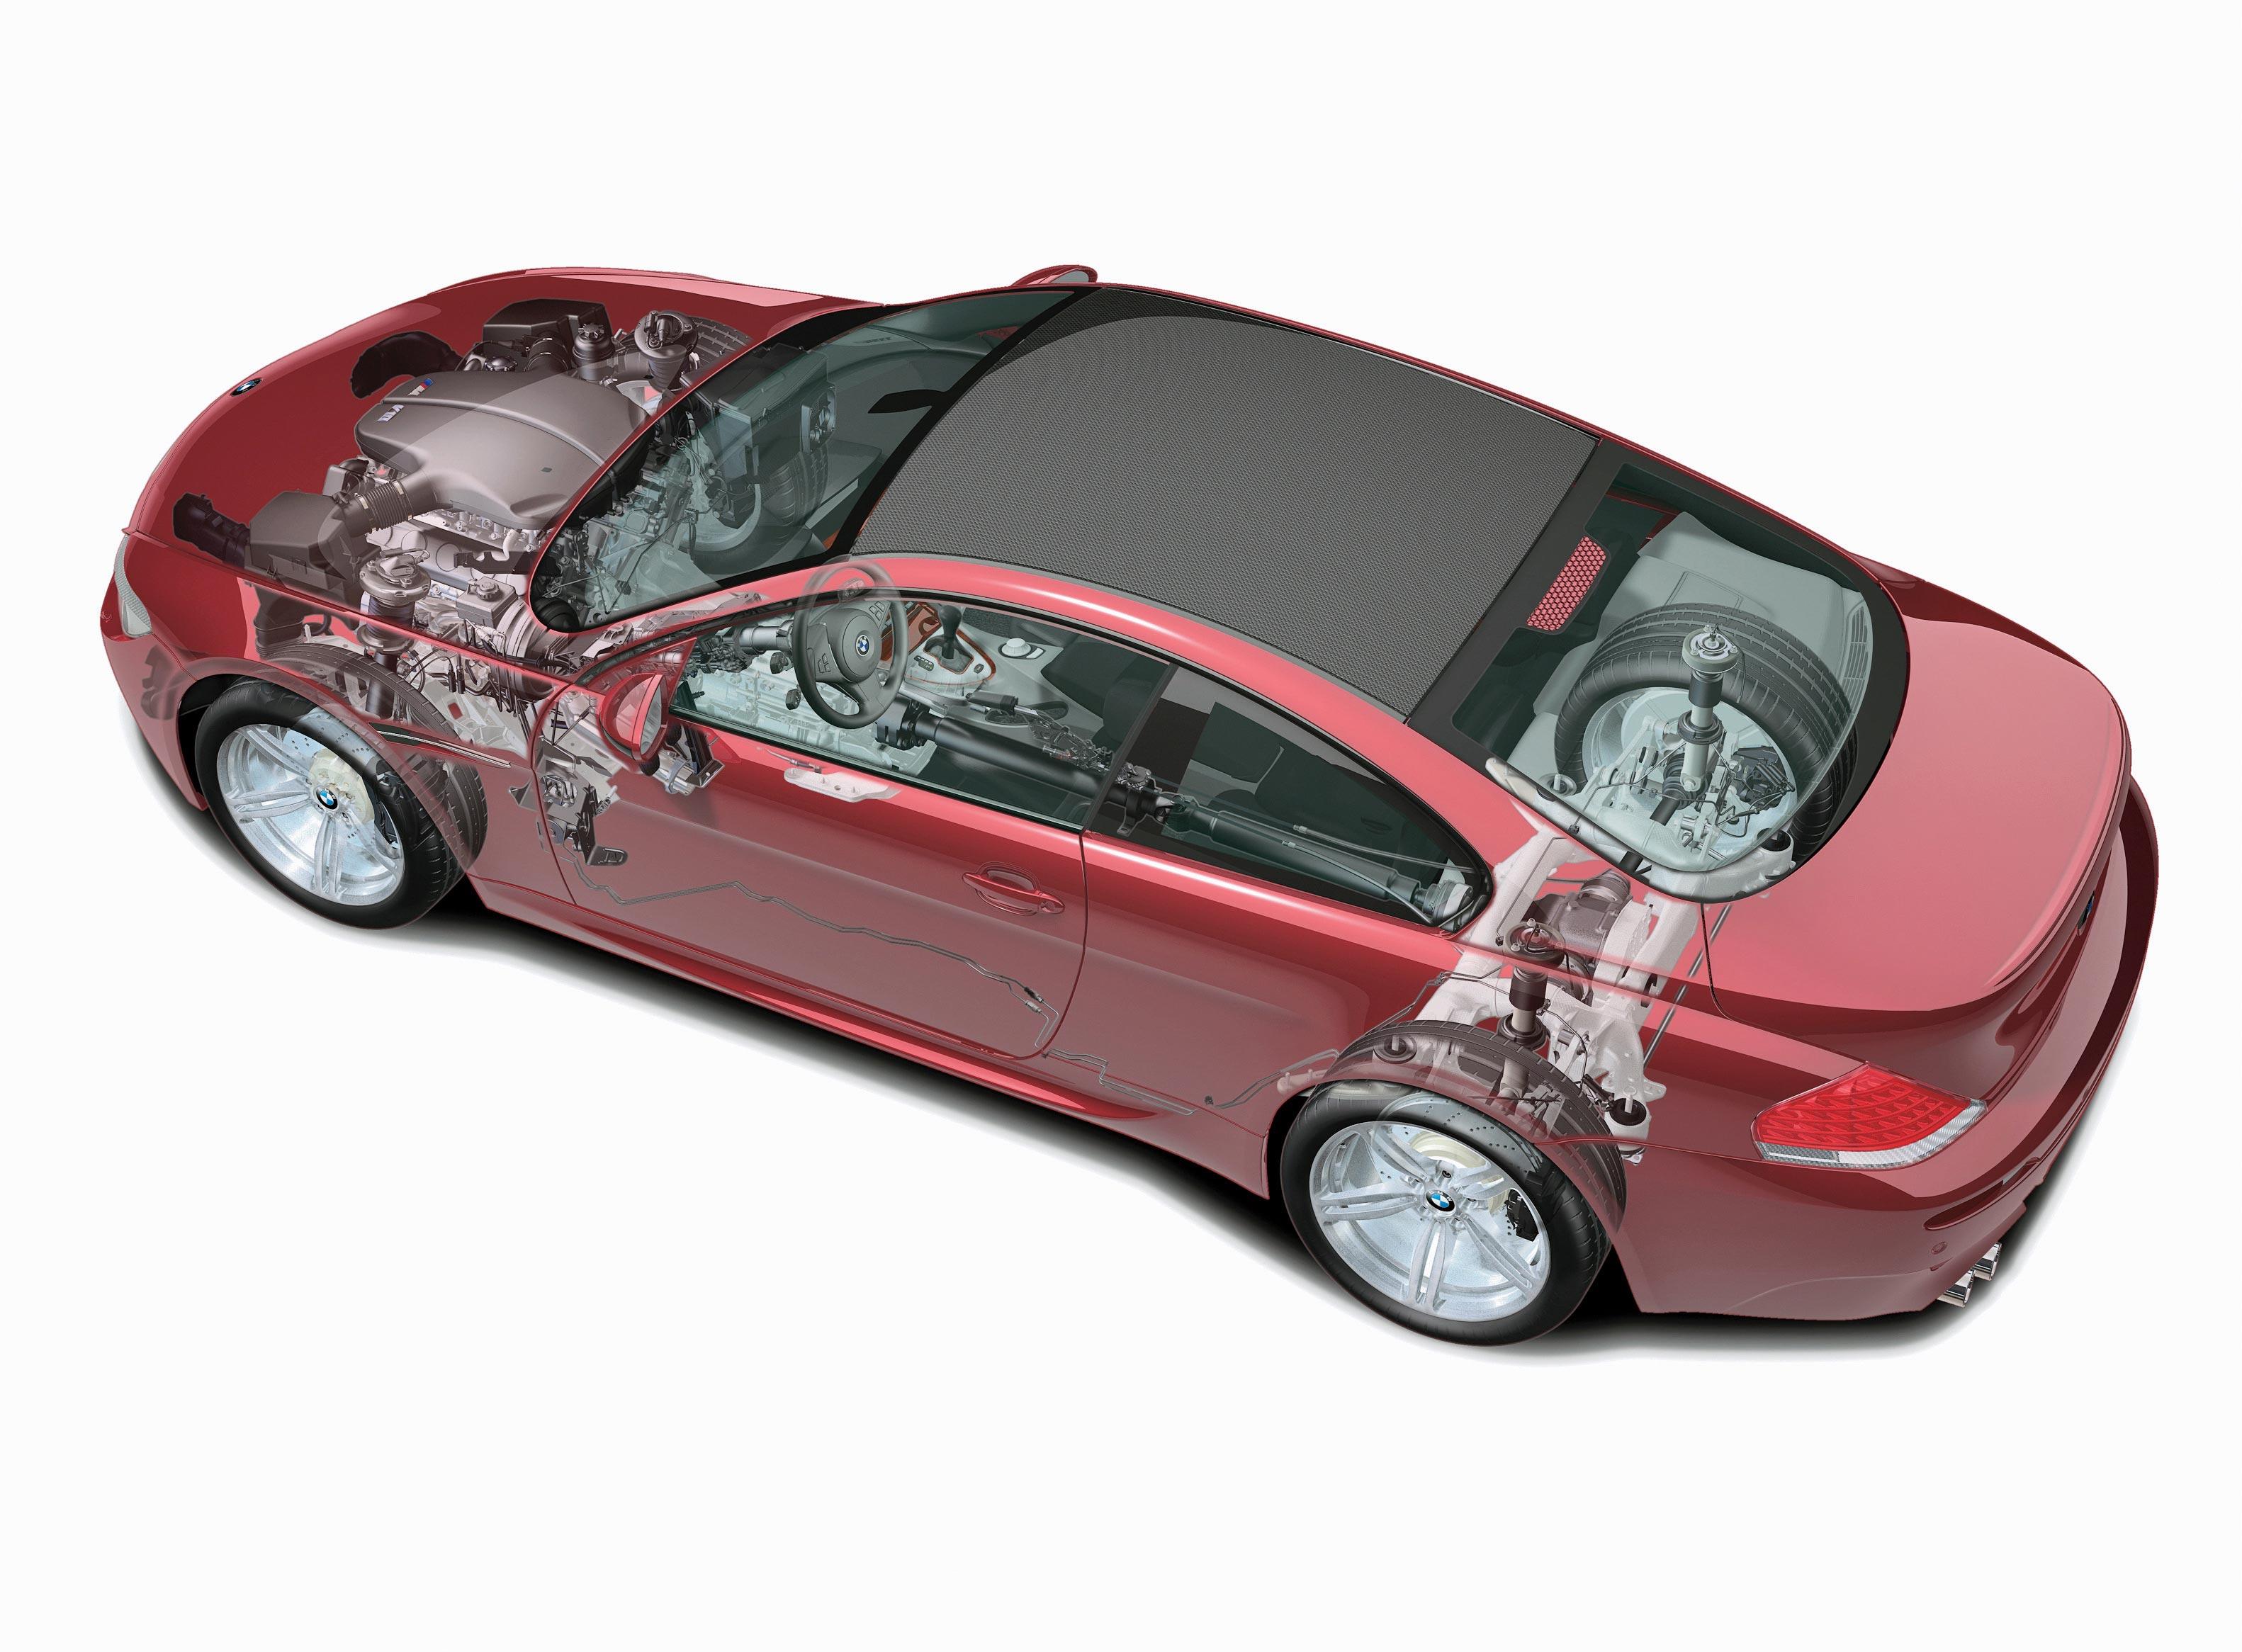 BMW 6 Series E63 cutaway drawing